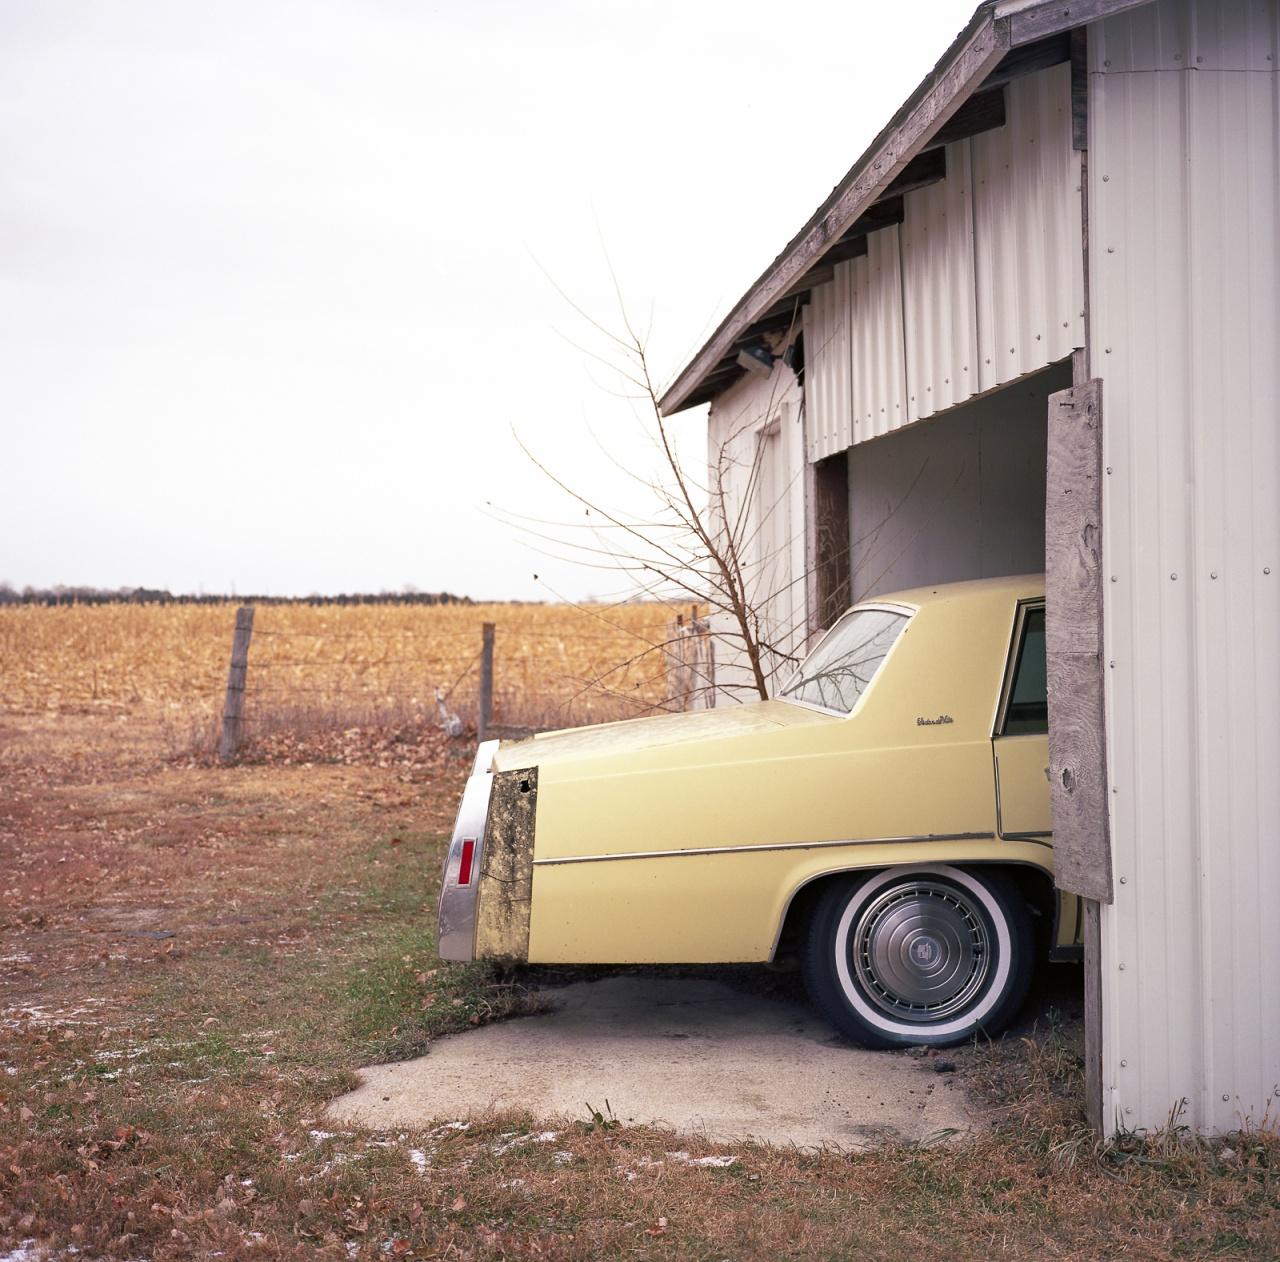 Cadillac, Stuart, NE